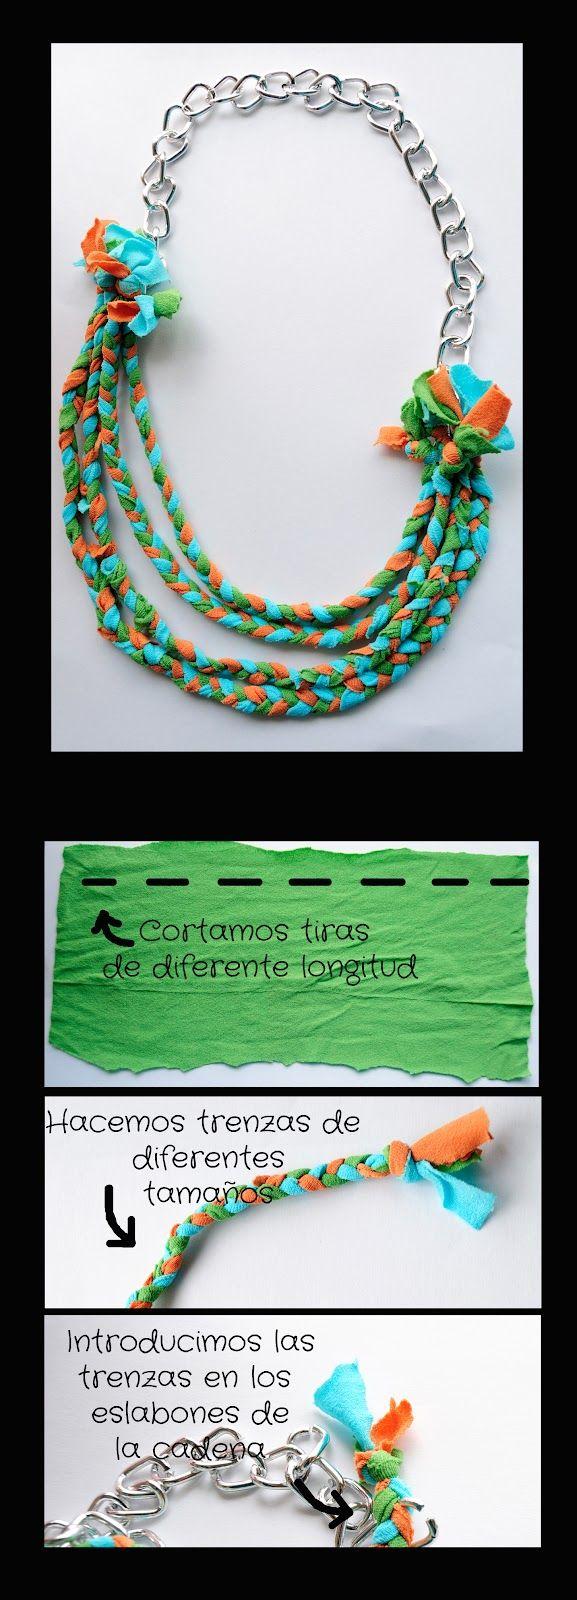 Collar con unas medias de colores | per fer amb nens | Pinterest ...